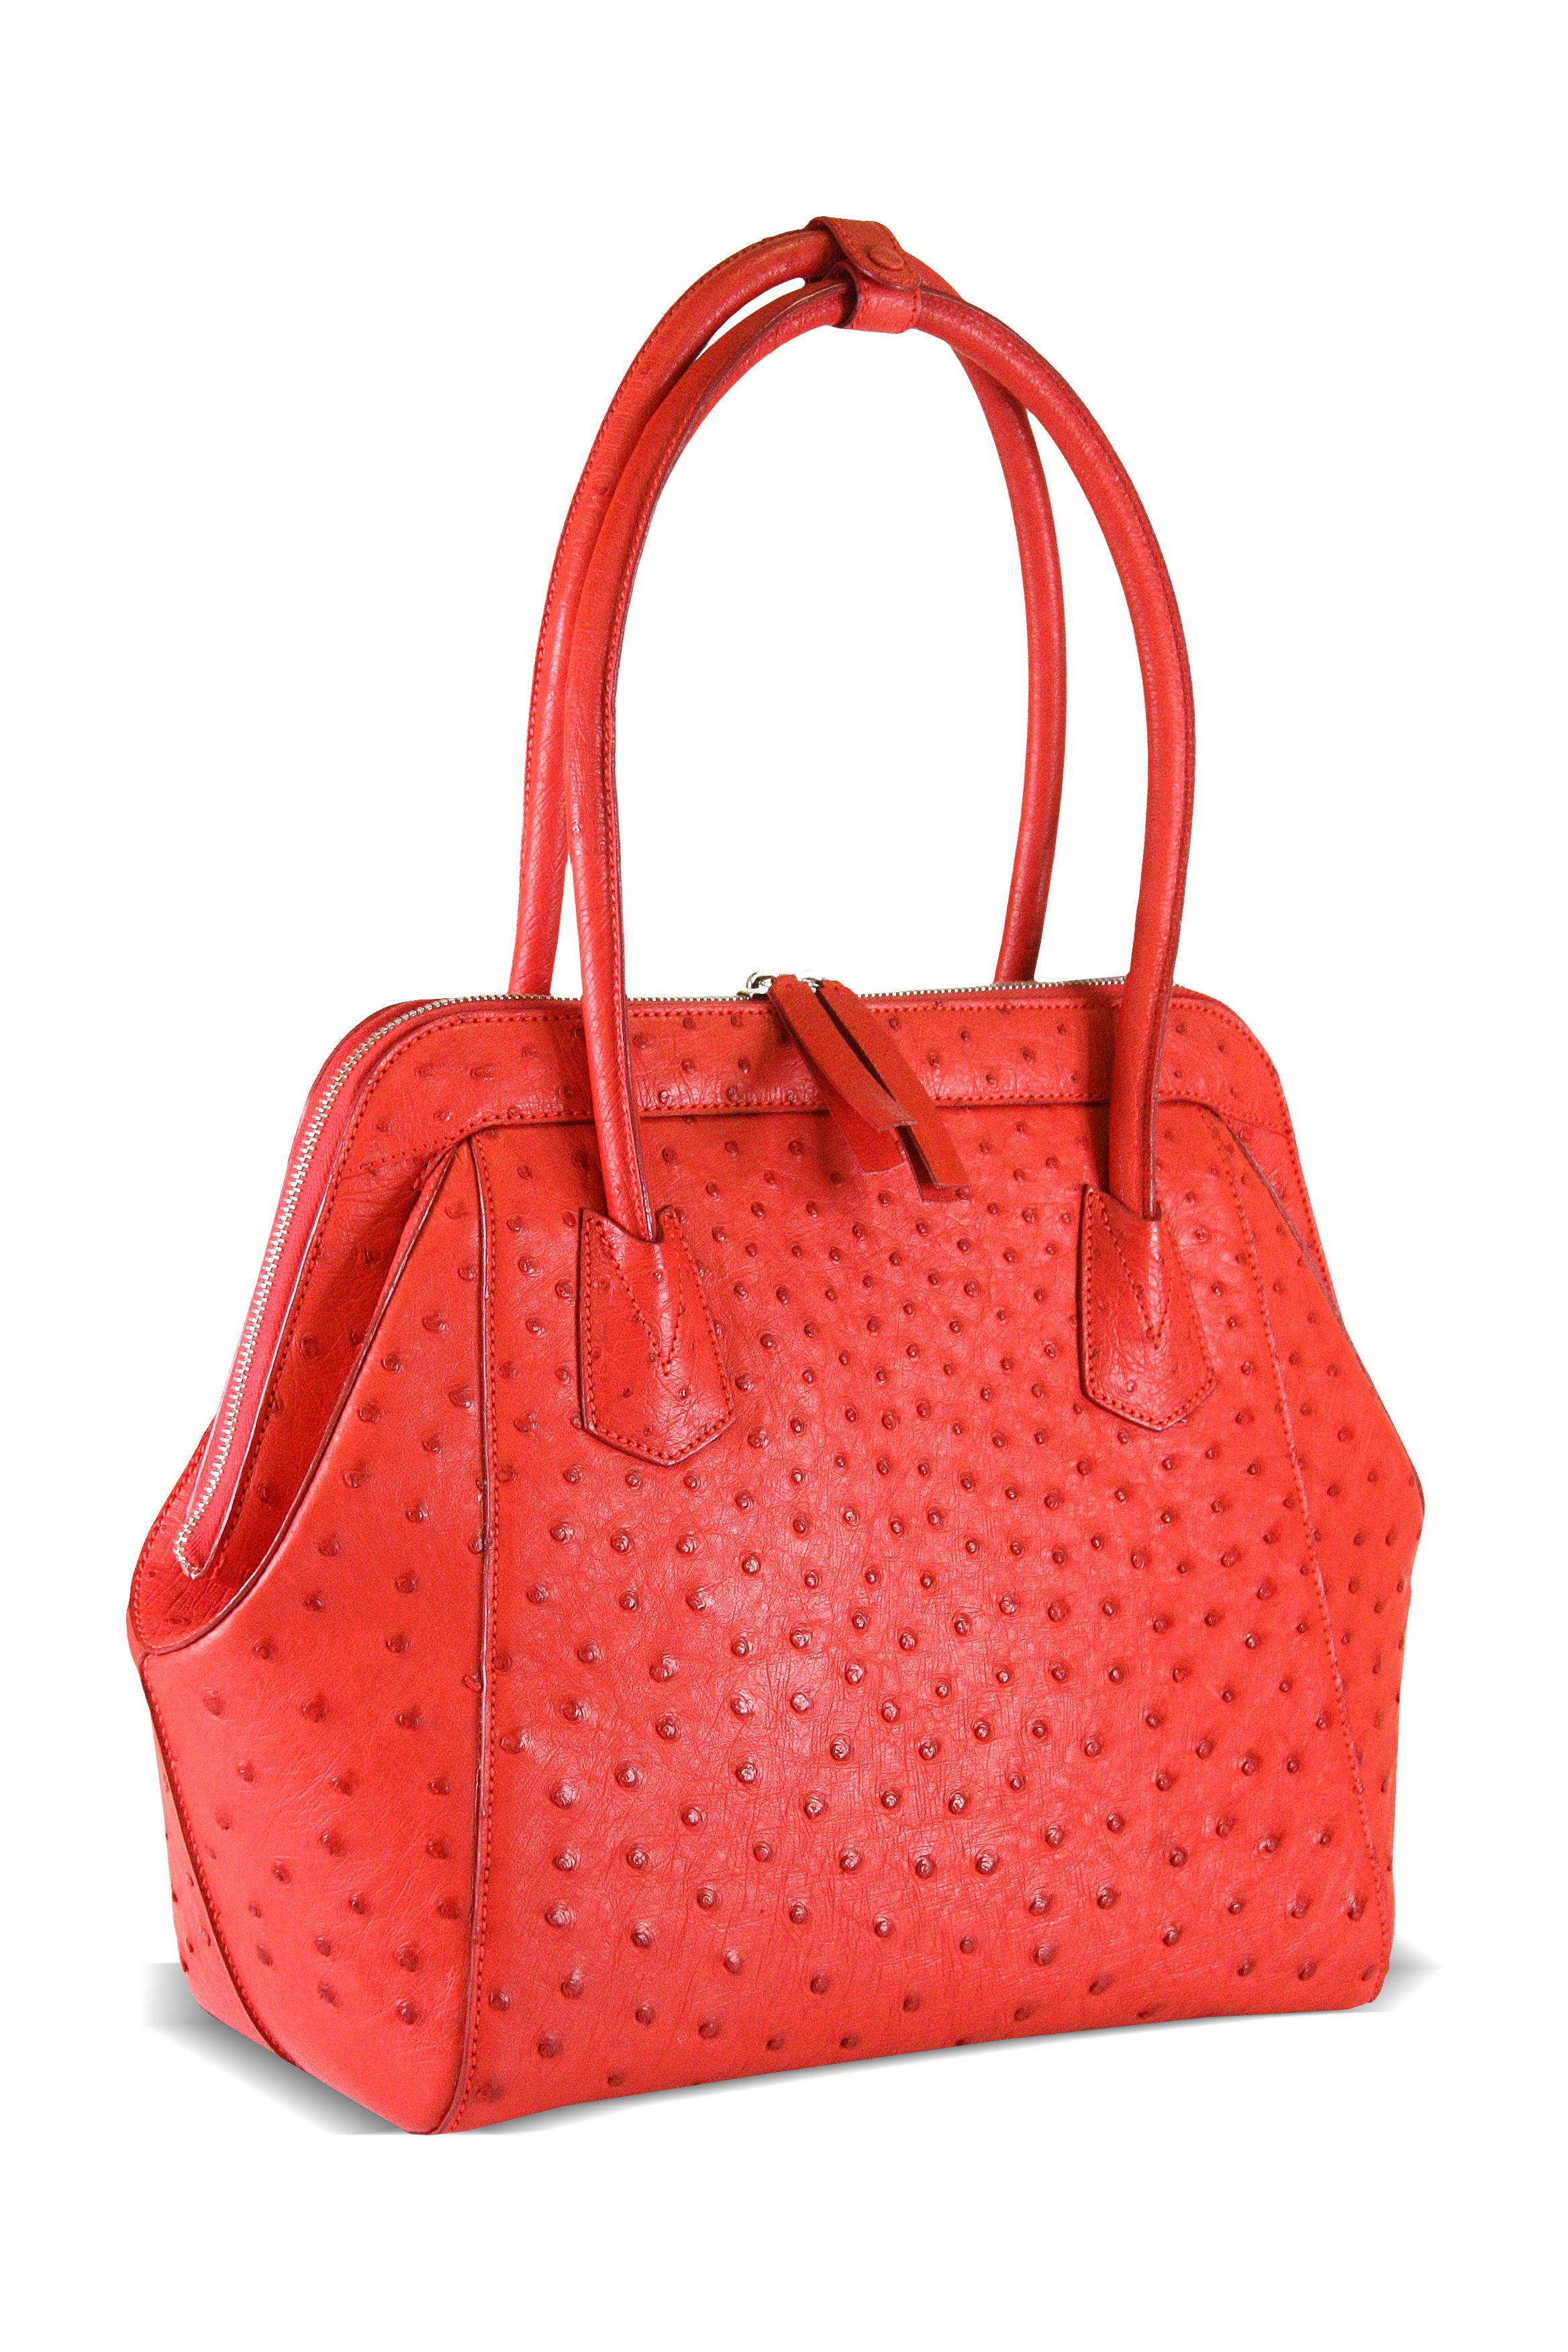 Scarlet Via La Moda Ostrich Leather Handbag